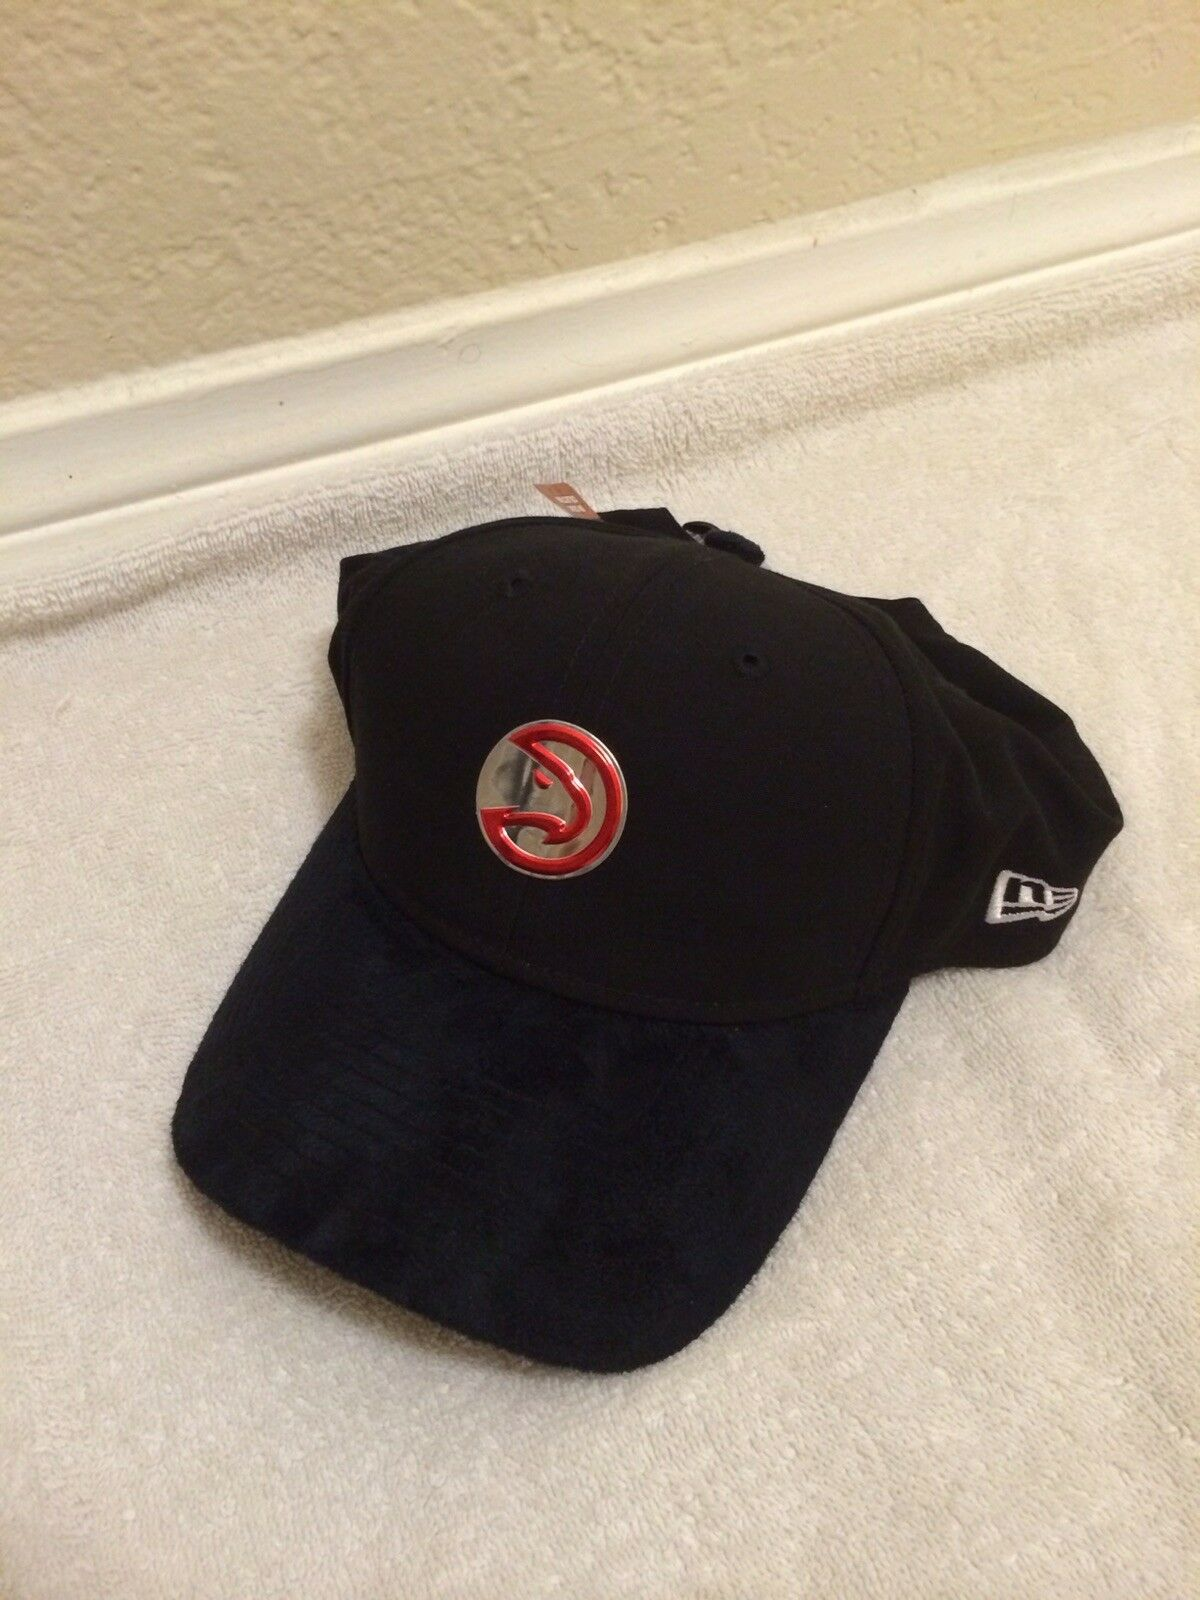 New Era 9twenty W/Suede Adjustable Atlanta Hawks Hat W/Suede 9twenty Bill. OSFM. b6cd40